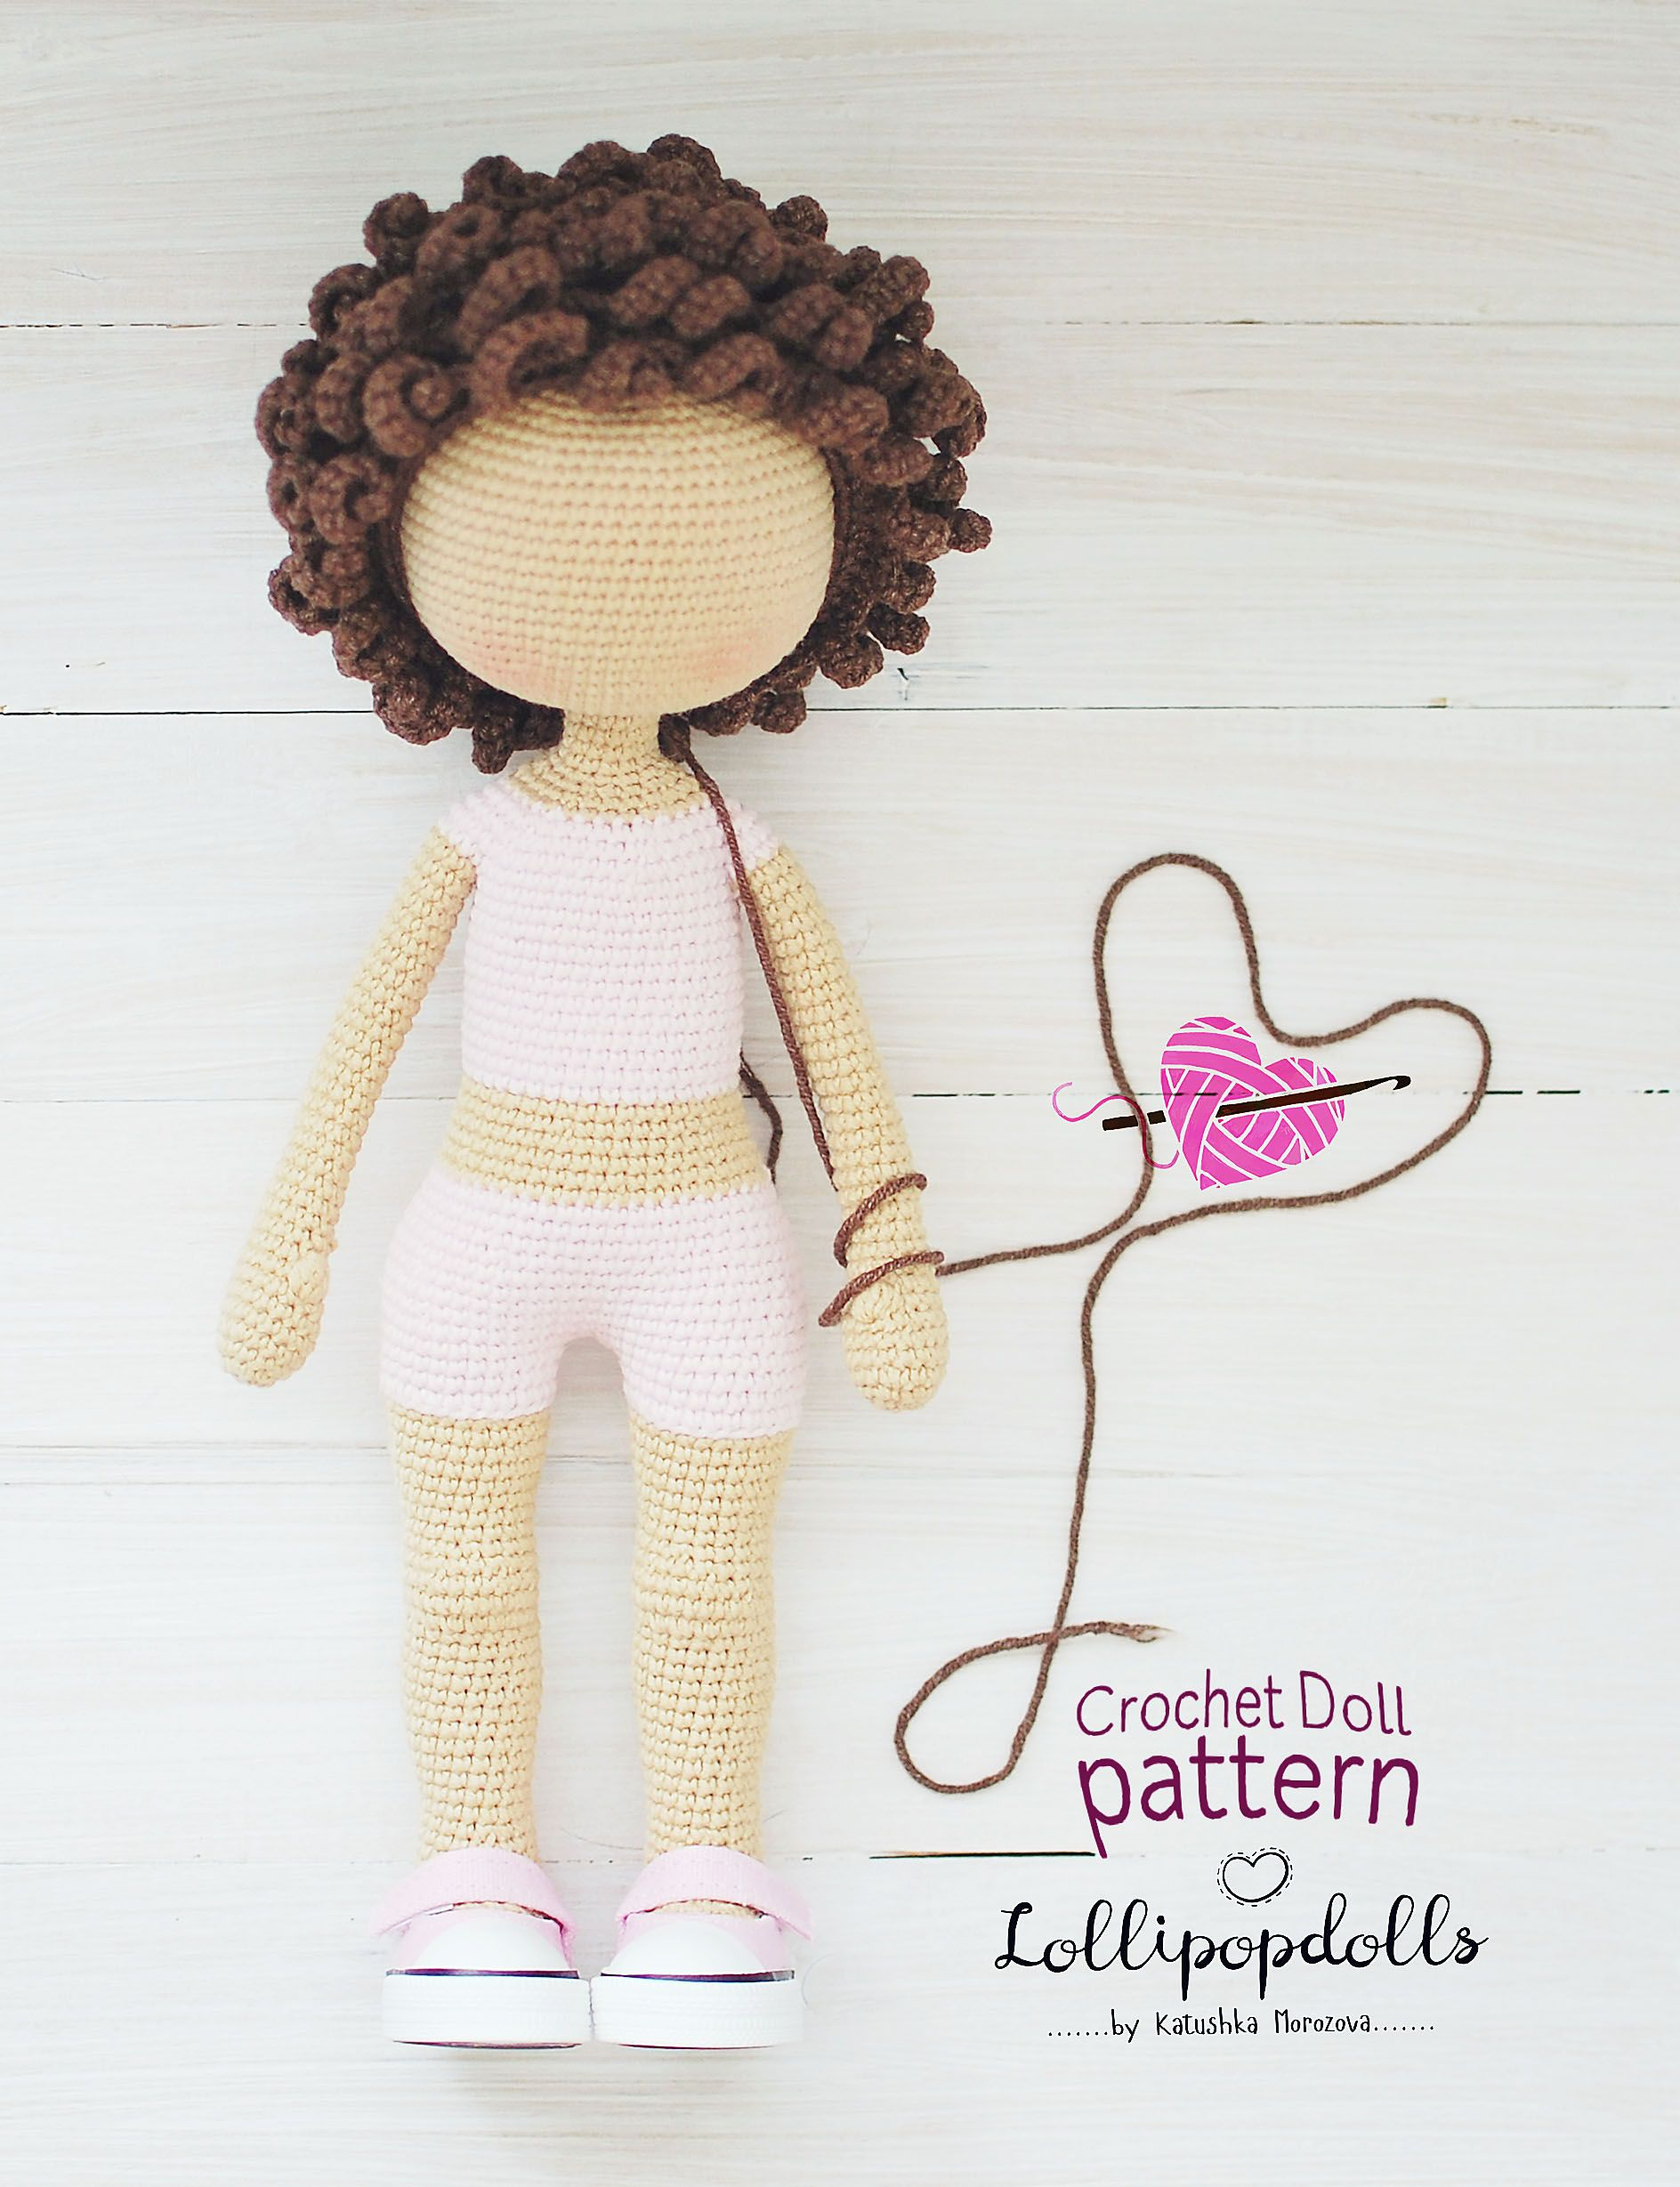 Amigurumi Treasures: 15 Crochet Projects To Cherish: Lee, Erinna ...   2458x1888